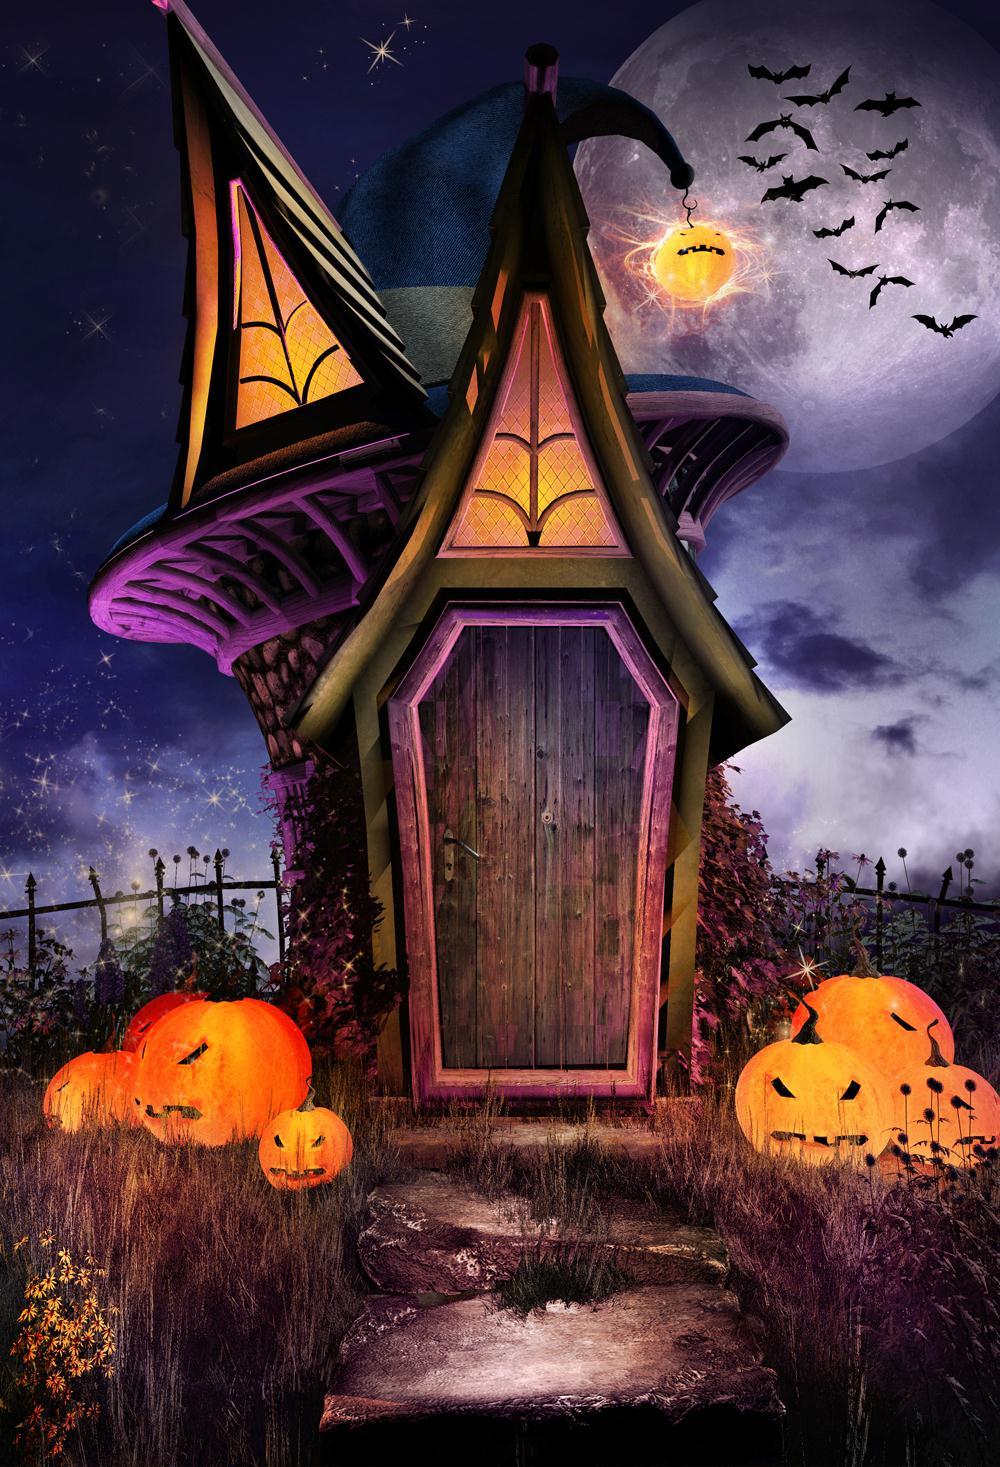 Huayi Thin Vinyl Halloween Bakcdrop Photography Background